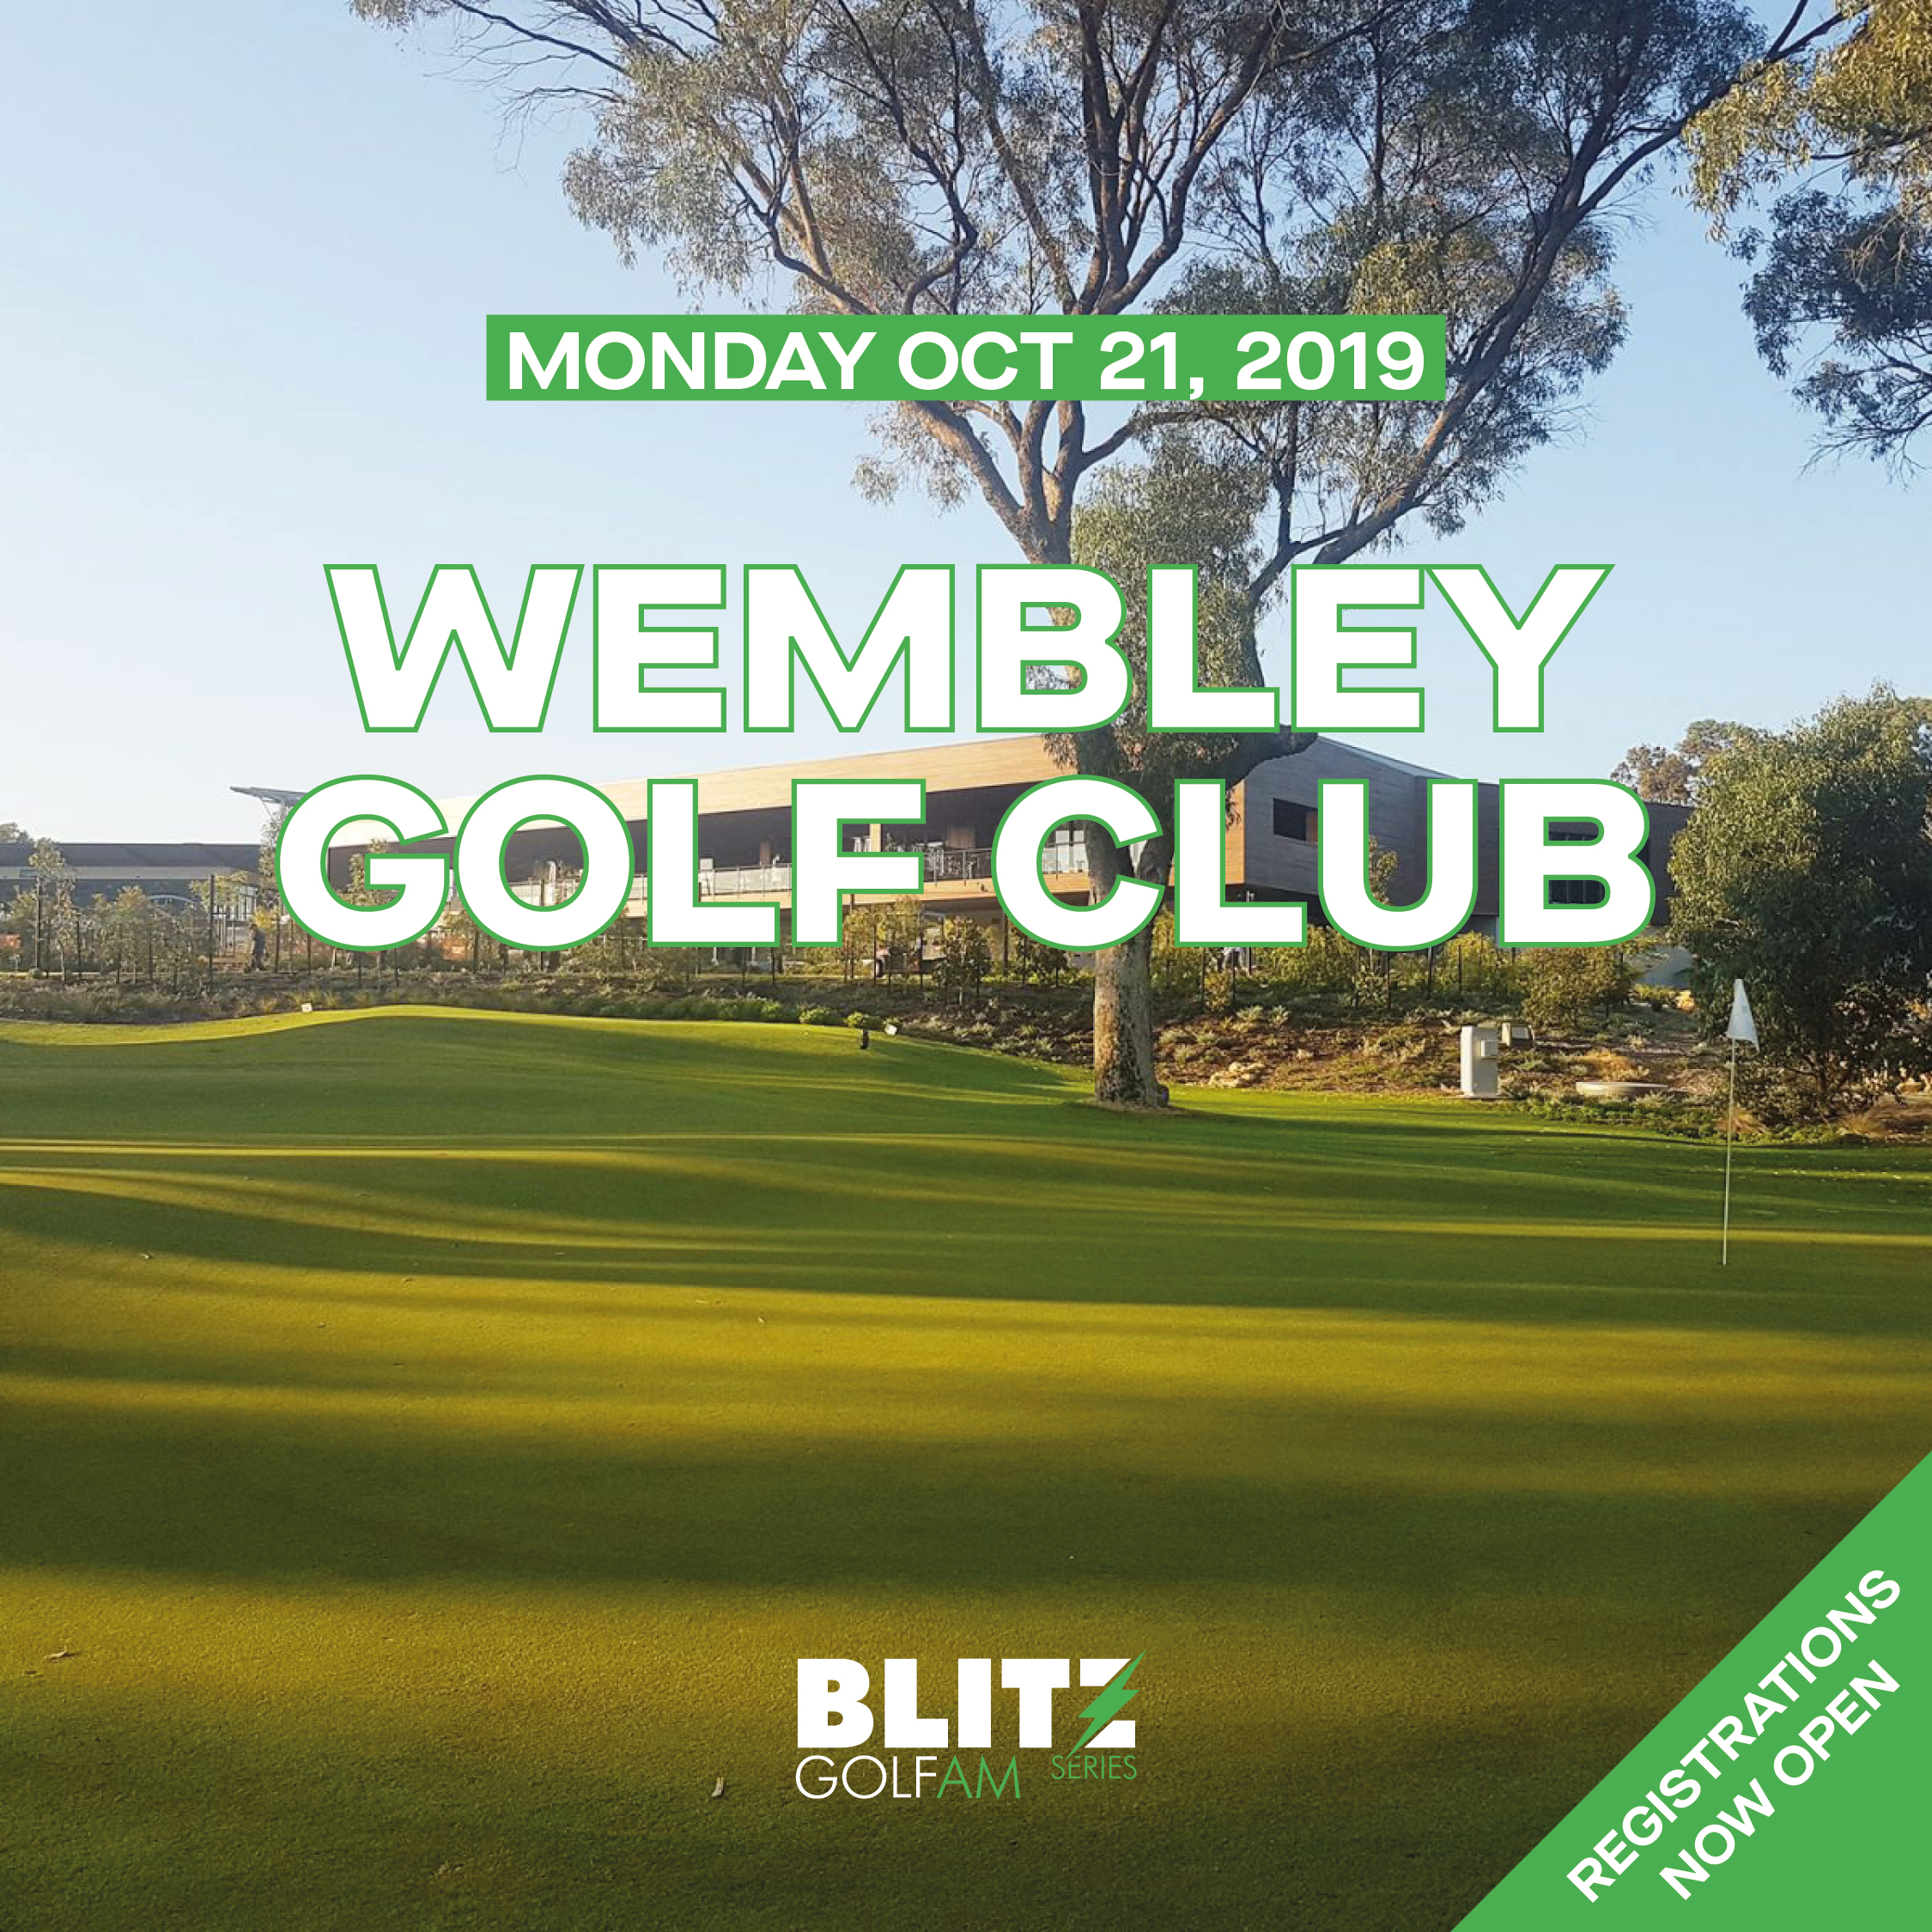 WA_Wembley_Blitz 2020_AM Series Launch_211019.jpg